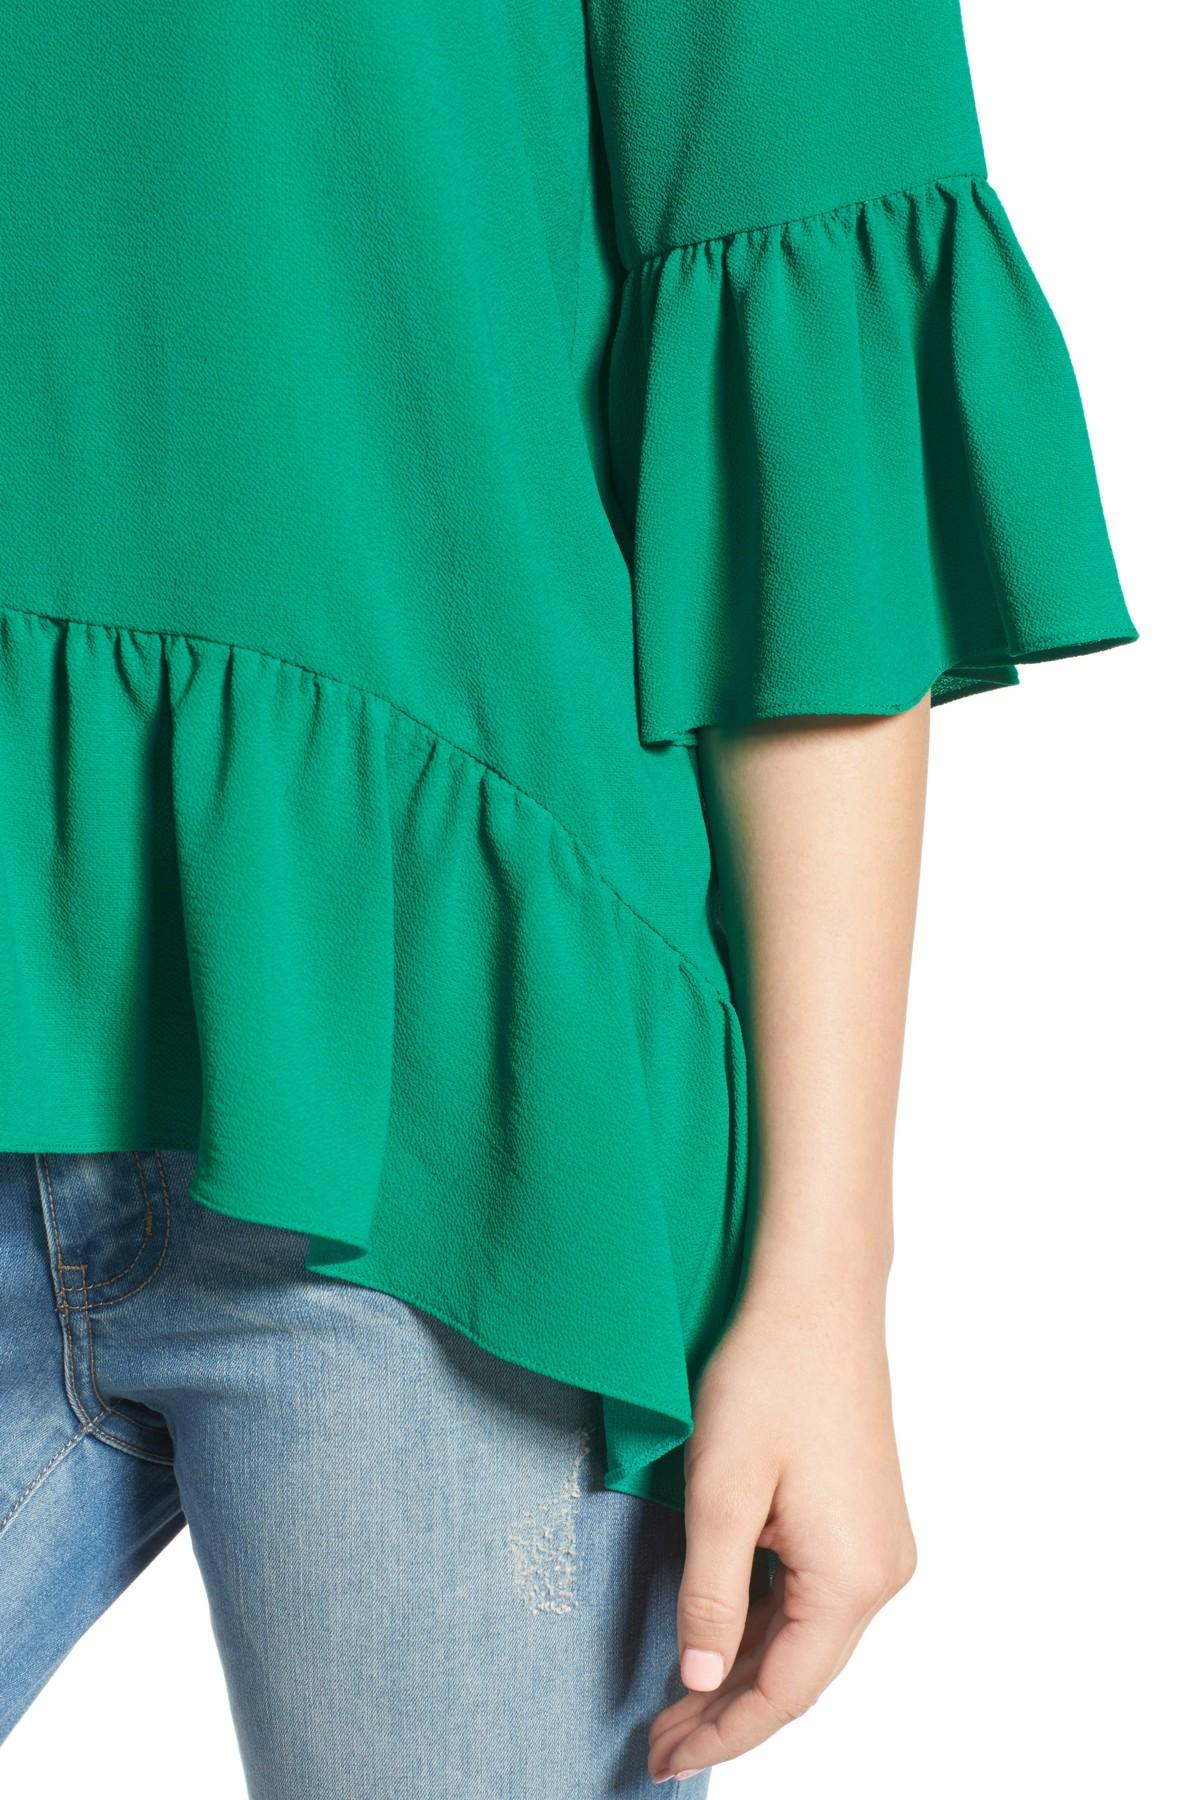 52b877a4b78f1d Lyst - Gibson Ruffled Handkerchief Hem Top (regular & Petite) in Green